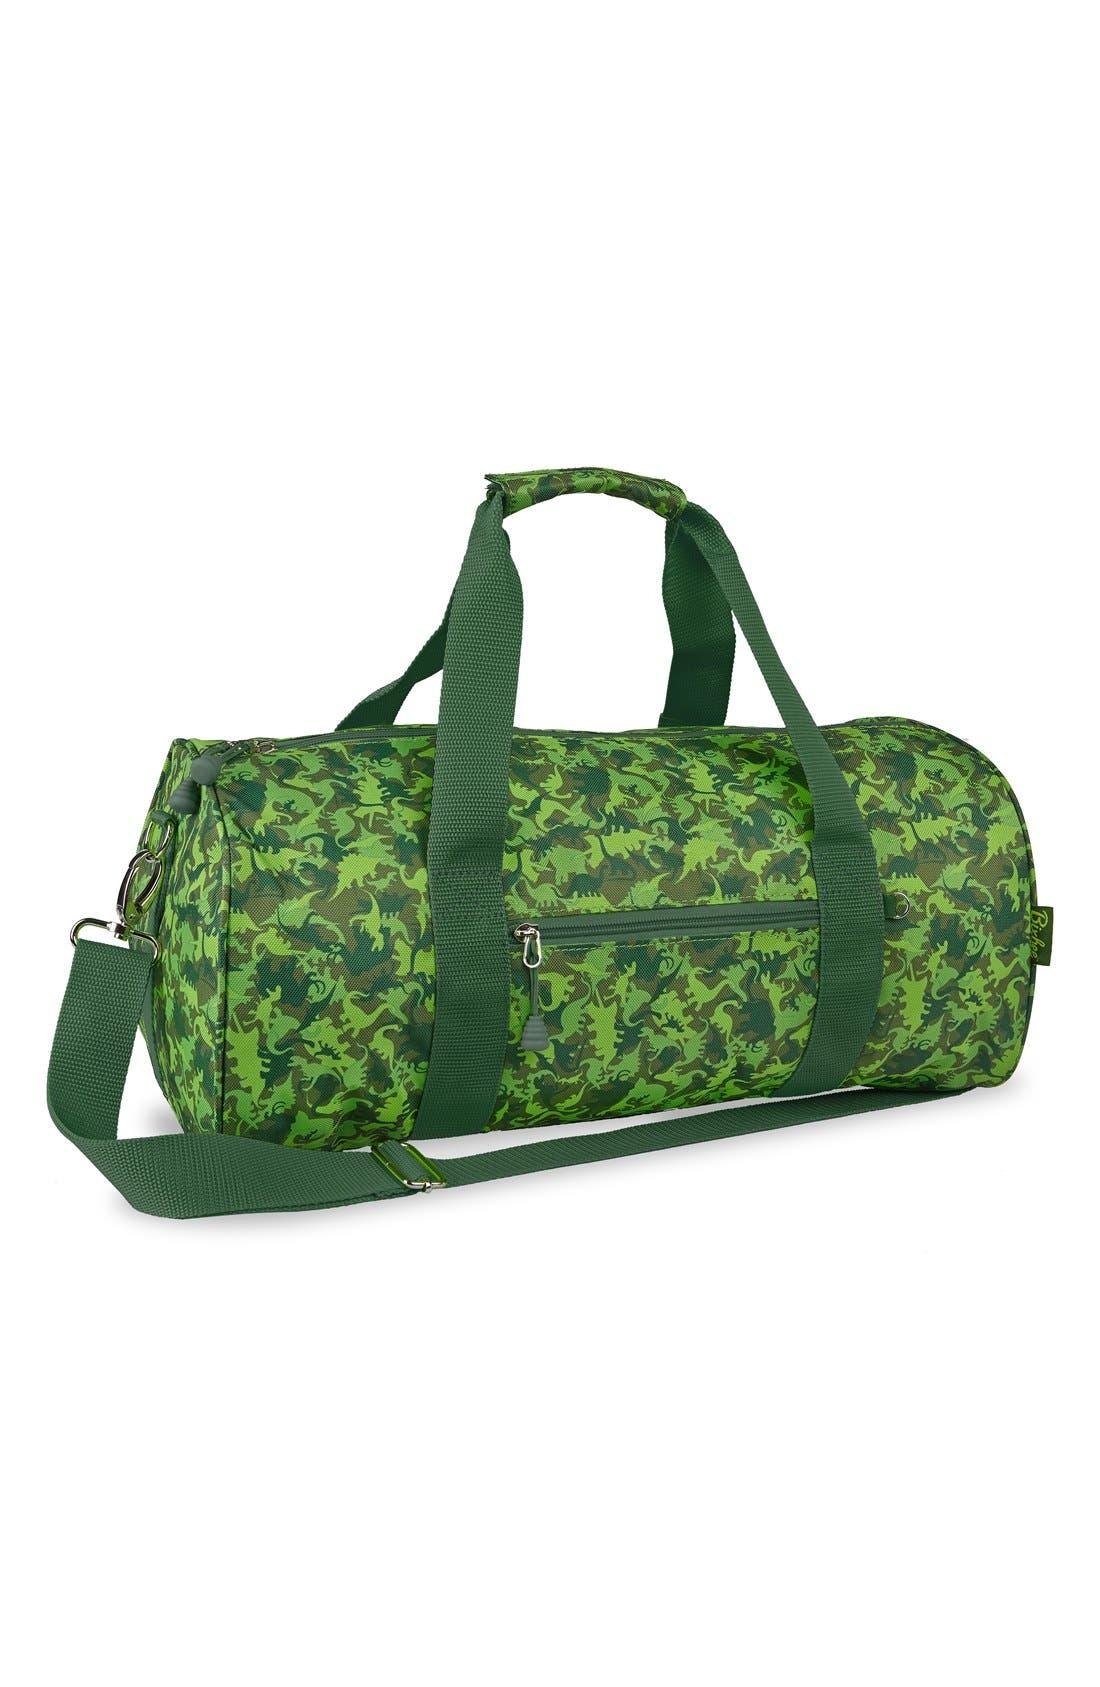 Alternate Image 1 Selected - Bixbee 'Large Dino Camo' Sports Duffel Bag (Boys)